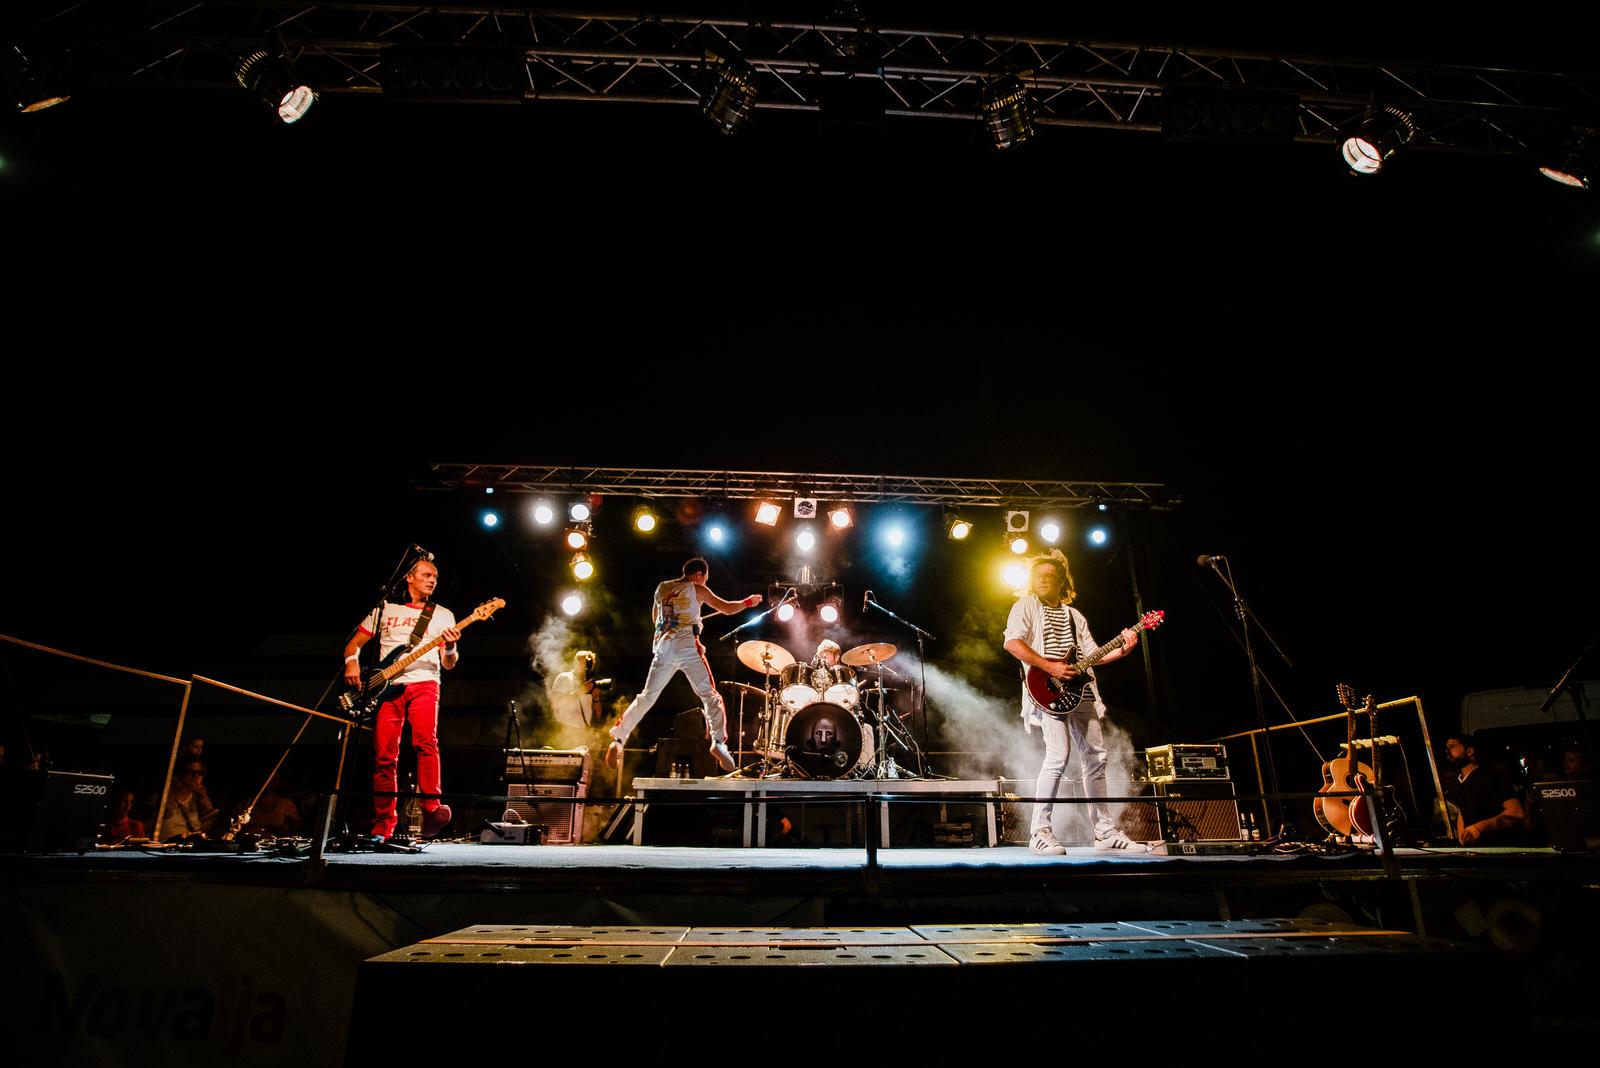 likaclub_novalja_queen-real-tribute-band_2019-22